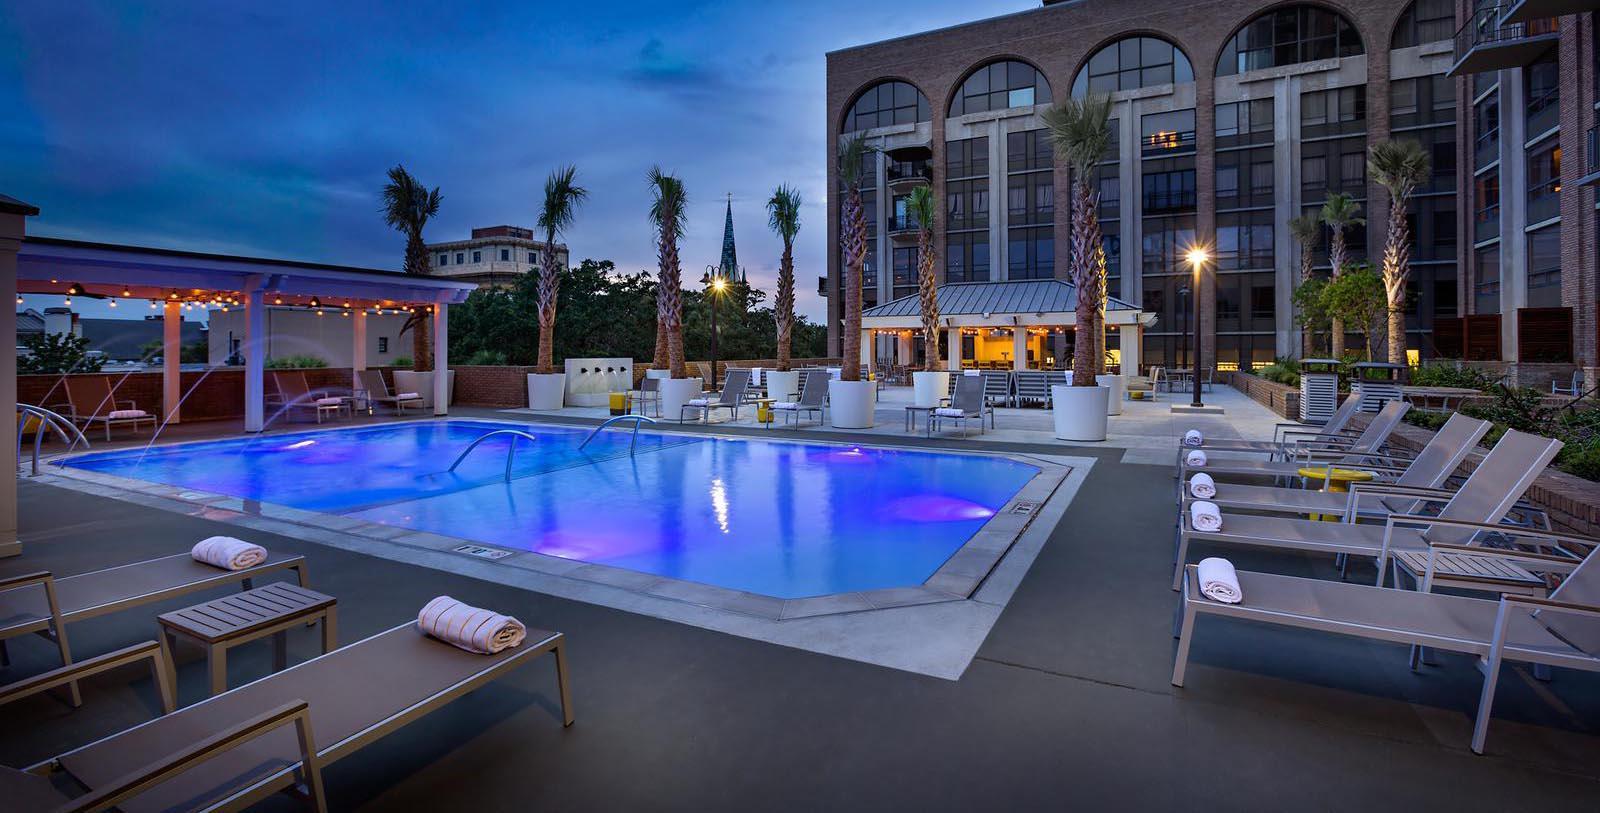 Image of Pool The DeSoto, 1890, Member of Historic Hotels of America, in Savannah, Georgia, Hot Deals